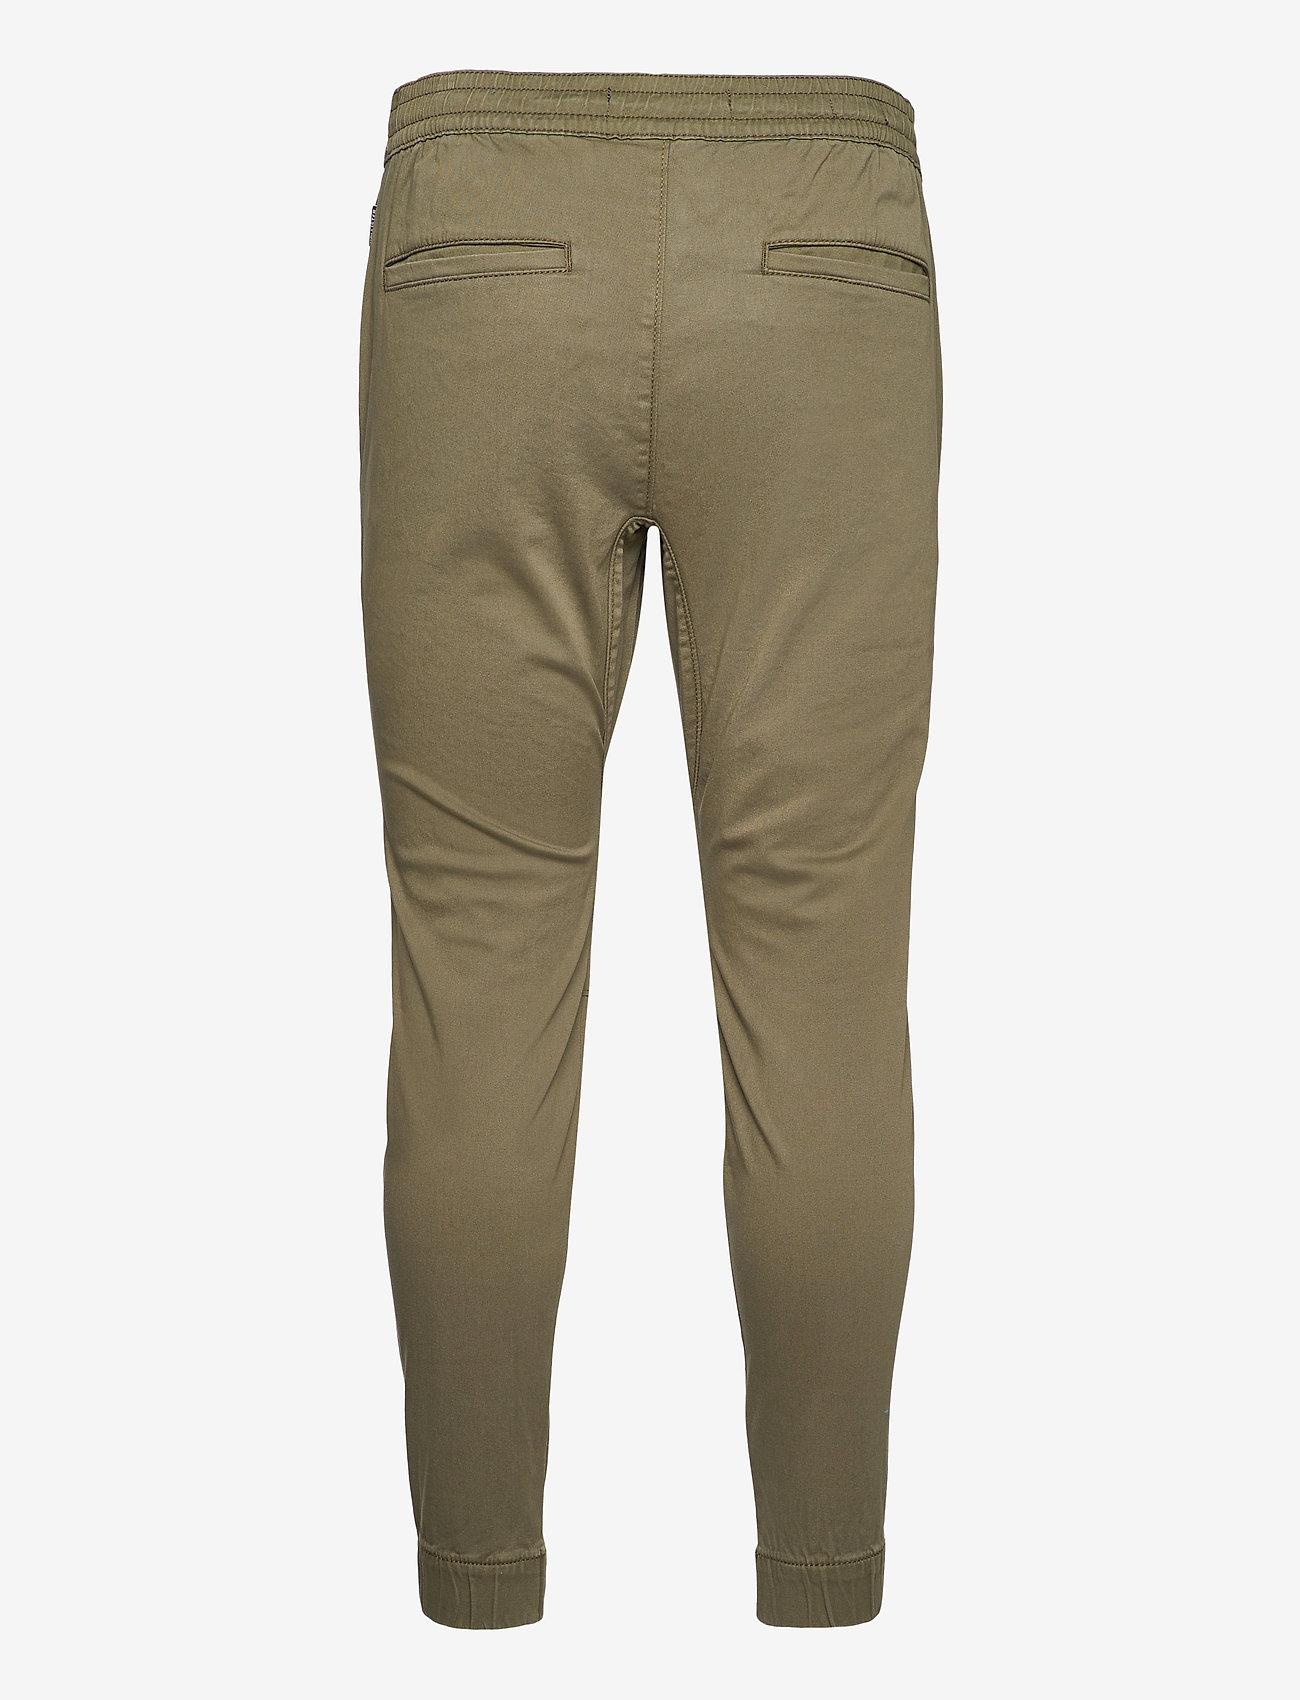 Hollister - HCo. GUYS PANTS - bottoms - olive skinny jogger - 1